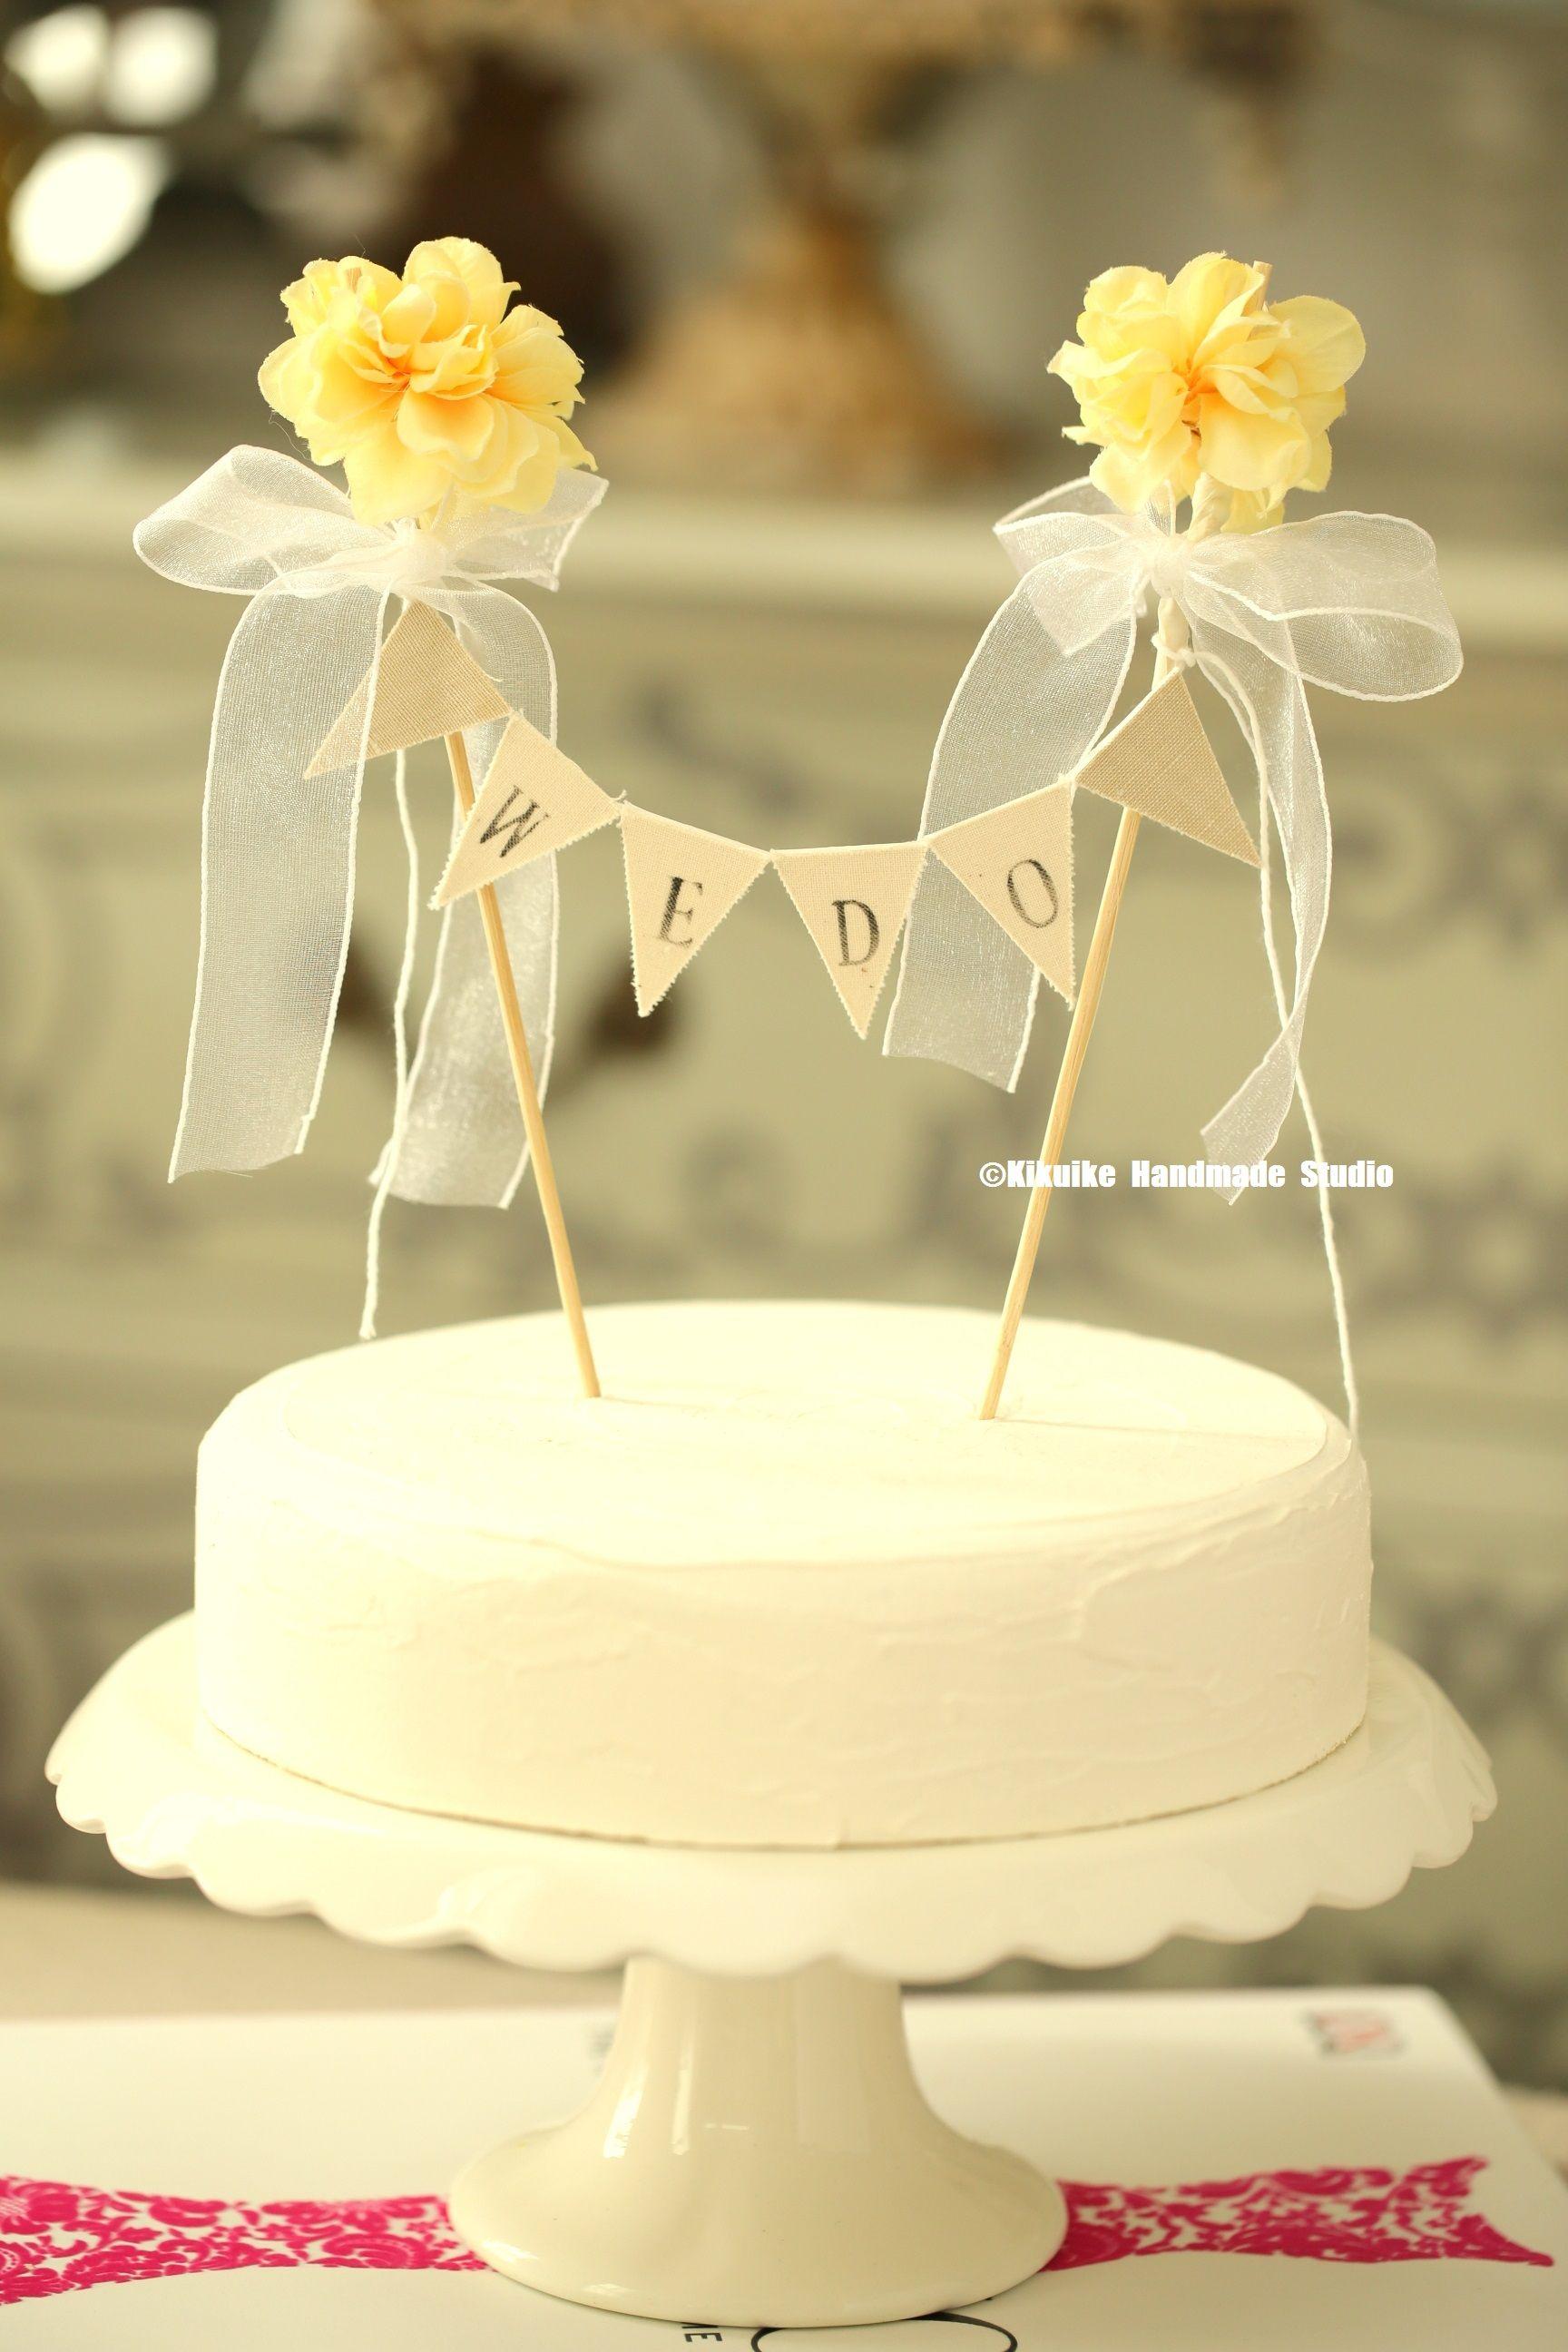 We Do Wedding Cake Banner,Flower Cake bunting,Rustic Wedding Cake ...